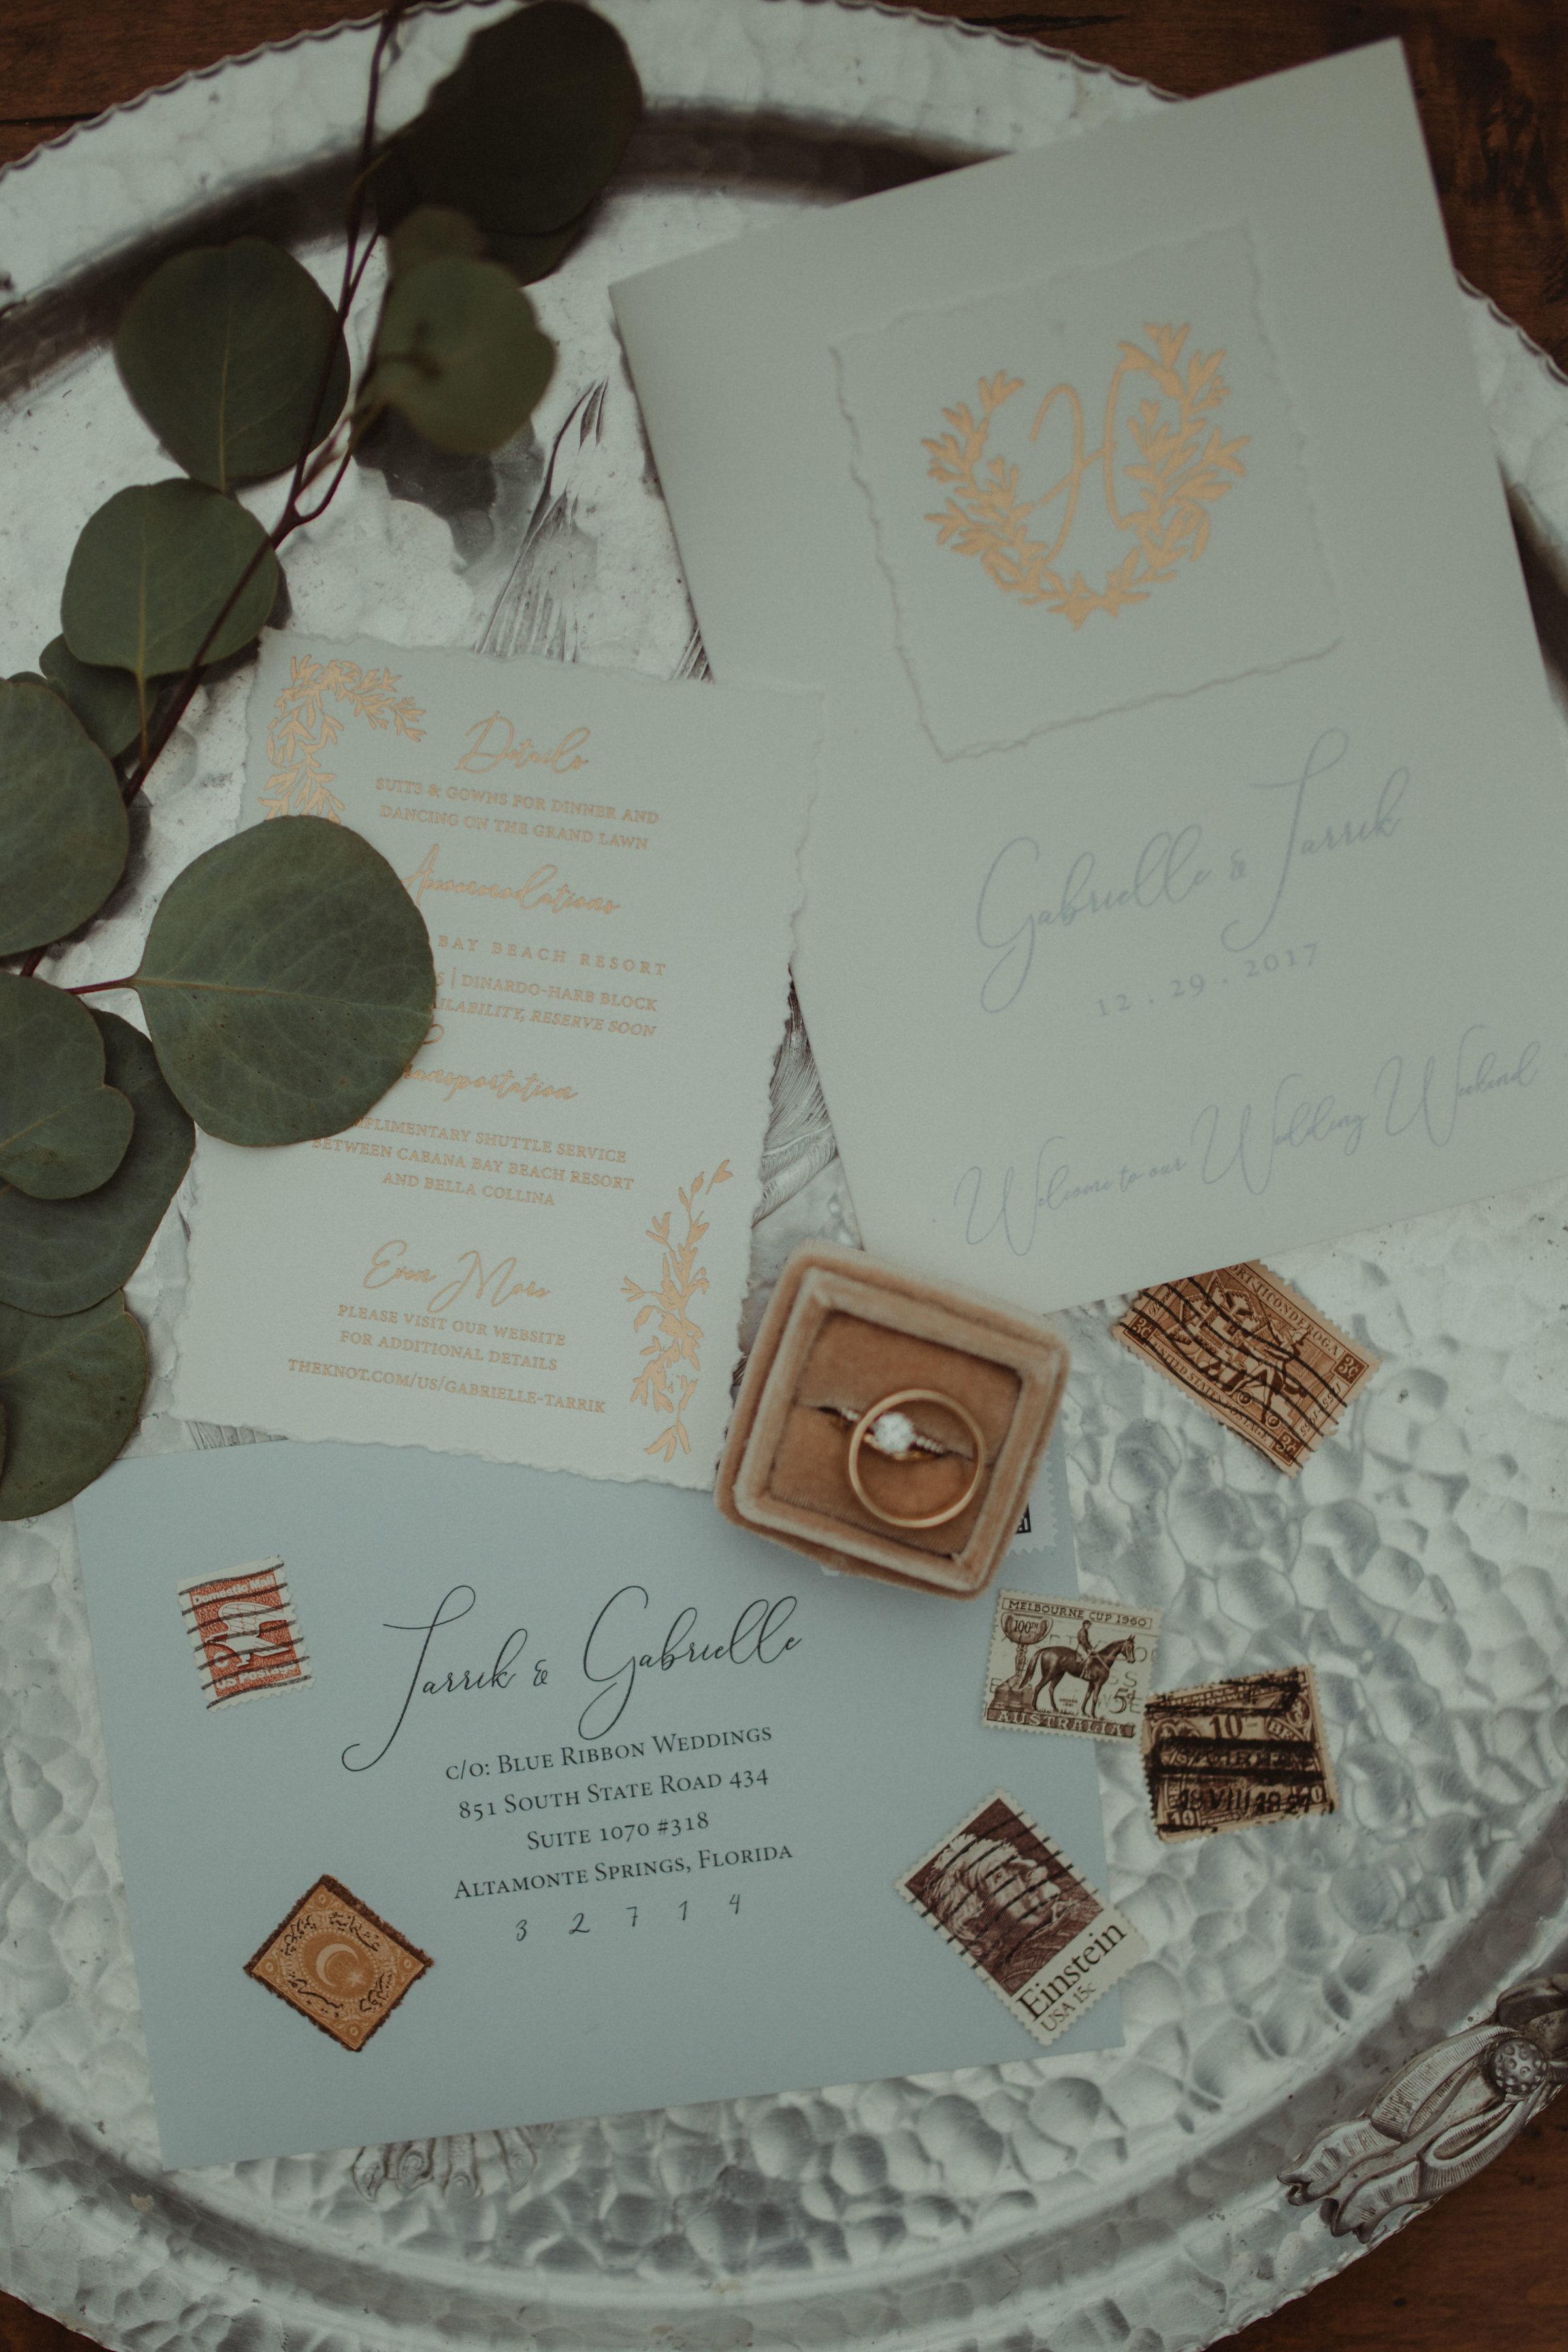 Orlando Wedding Planner Blue Ribbon Weddings  Orlando Wedding Photographer Aisles & Ivy  Wedding Ceremony on The Grand Lawn at Bella Collina  Wedding Reception in the Formal Ballroom at Bella Collina